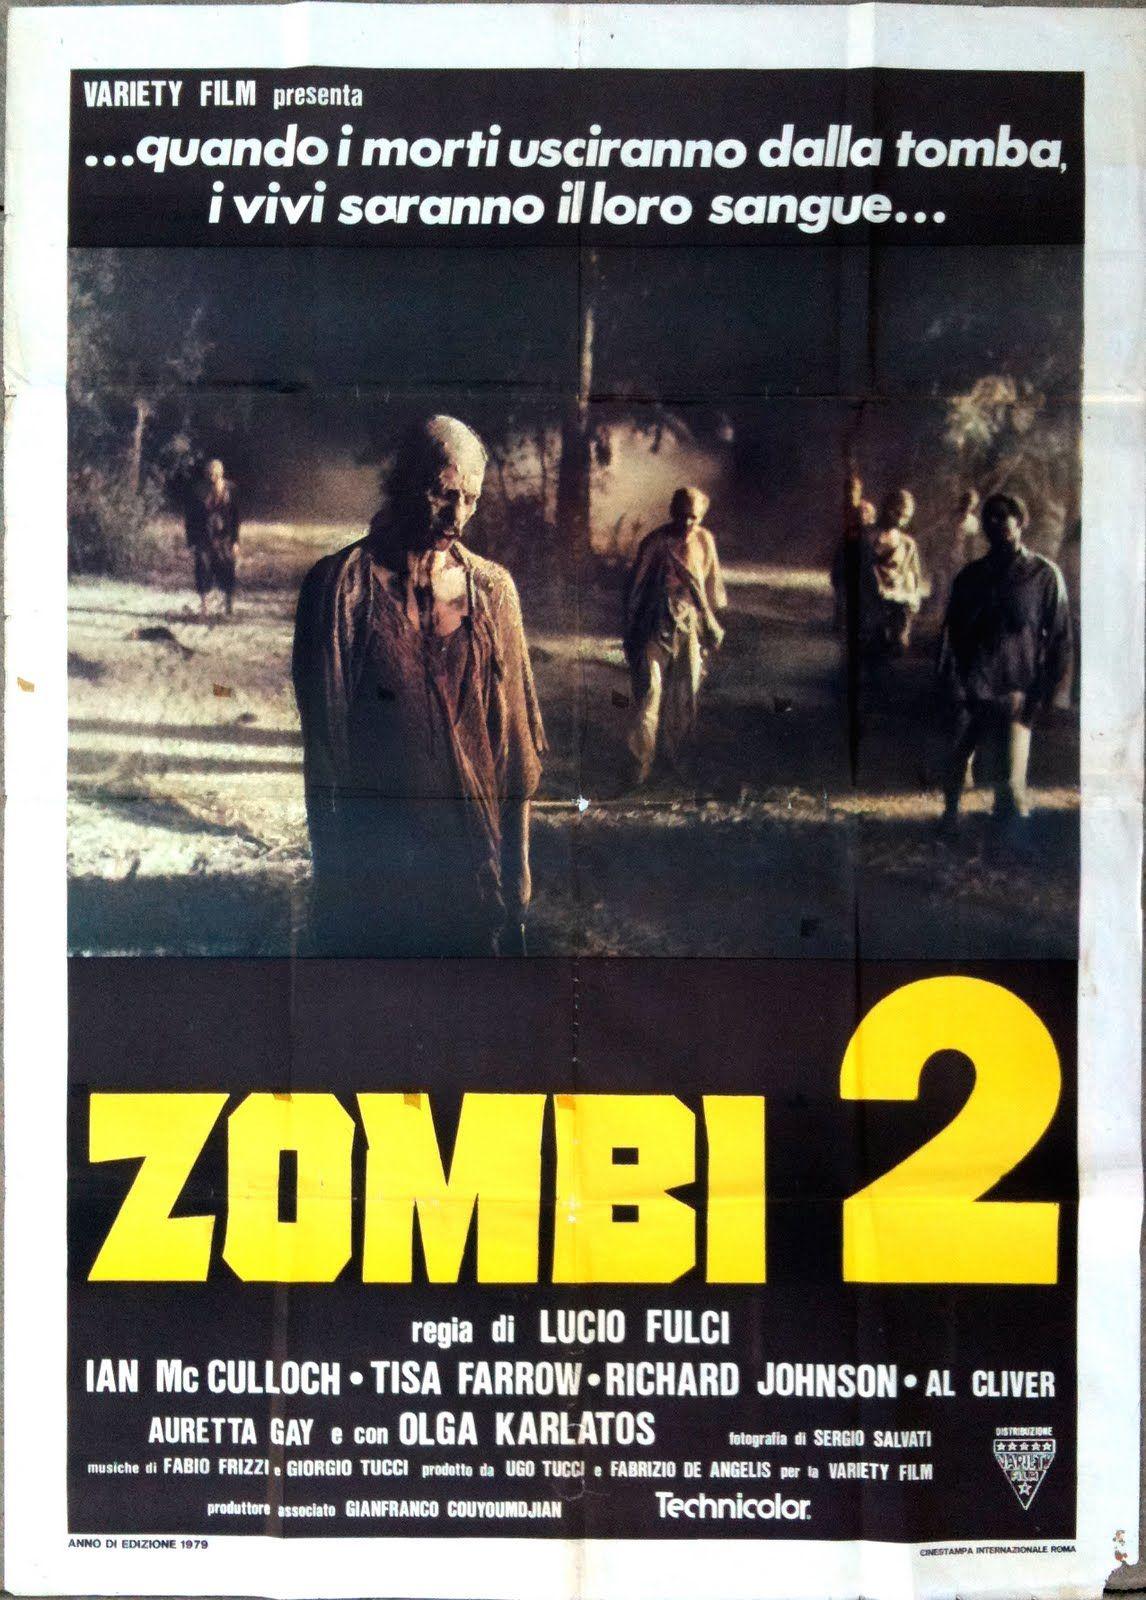 Zombi 2 (1979), the quintessential Italian zombie movie